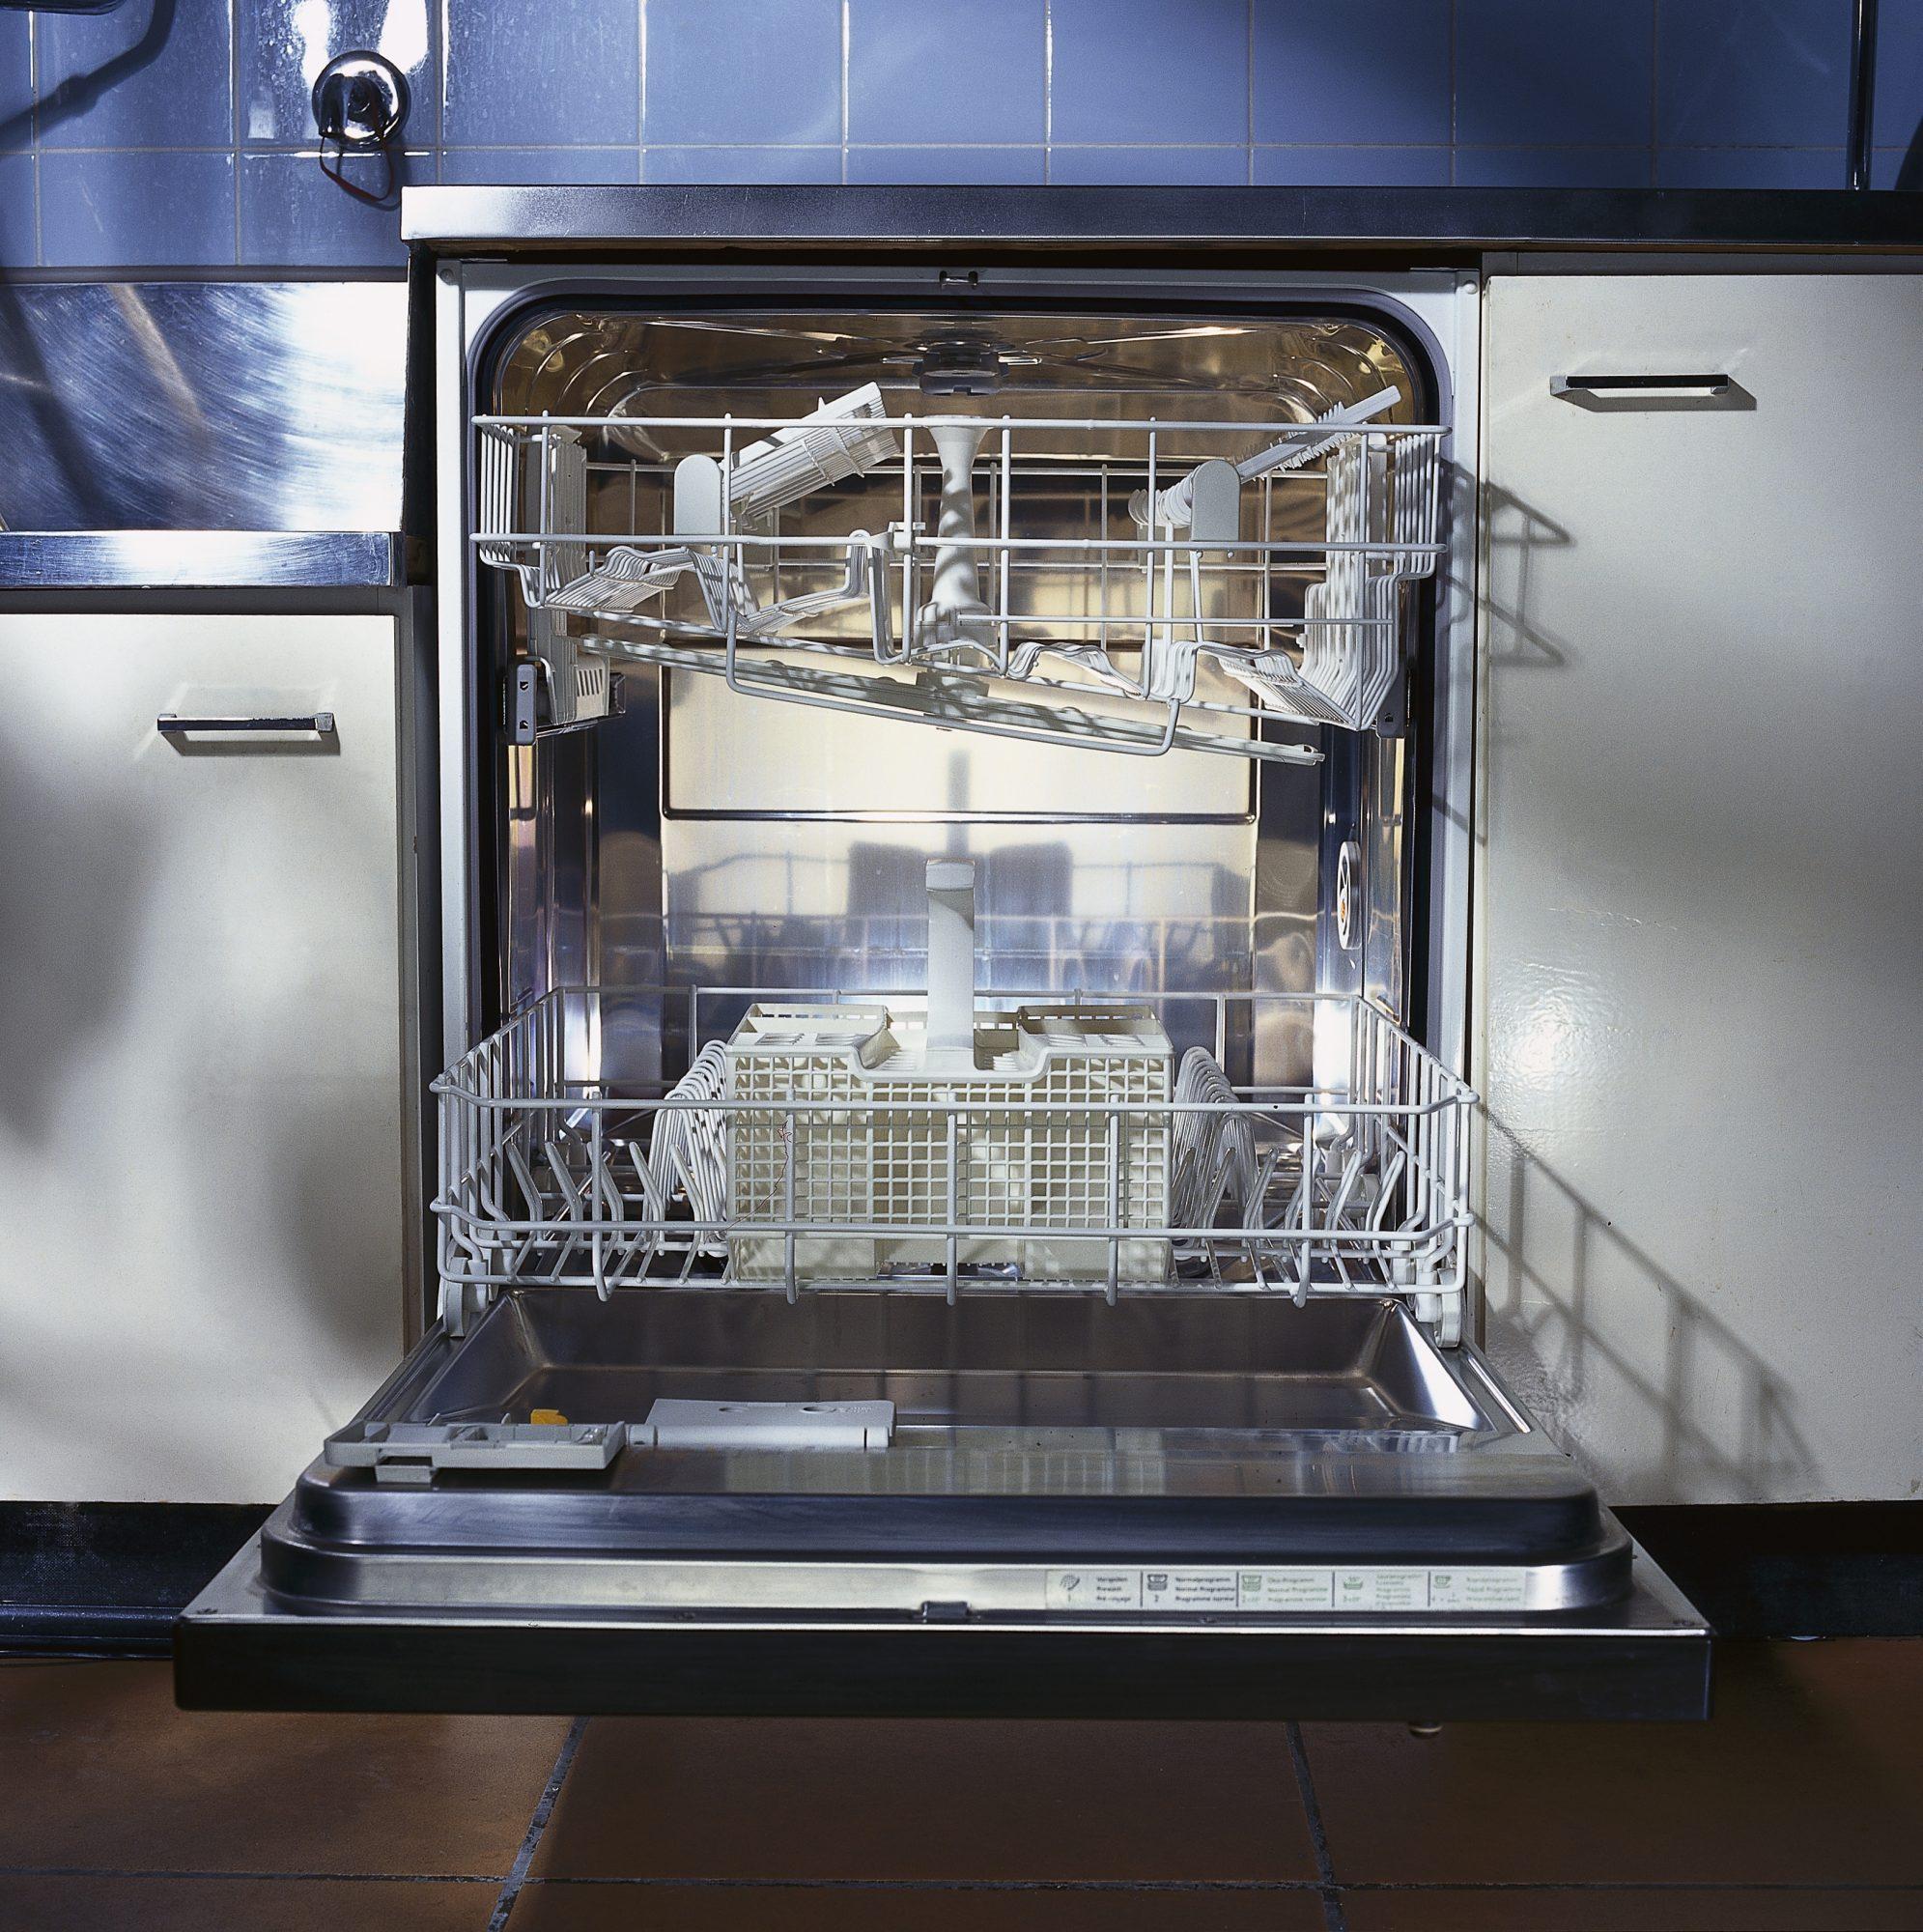 getty dishwasher image